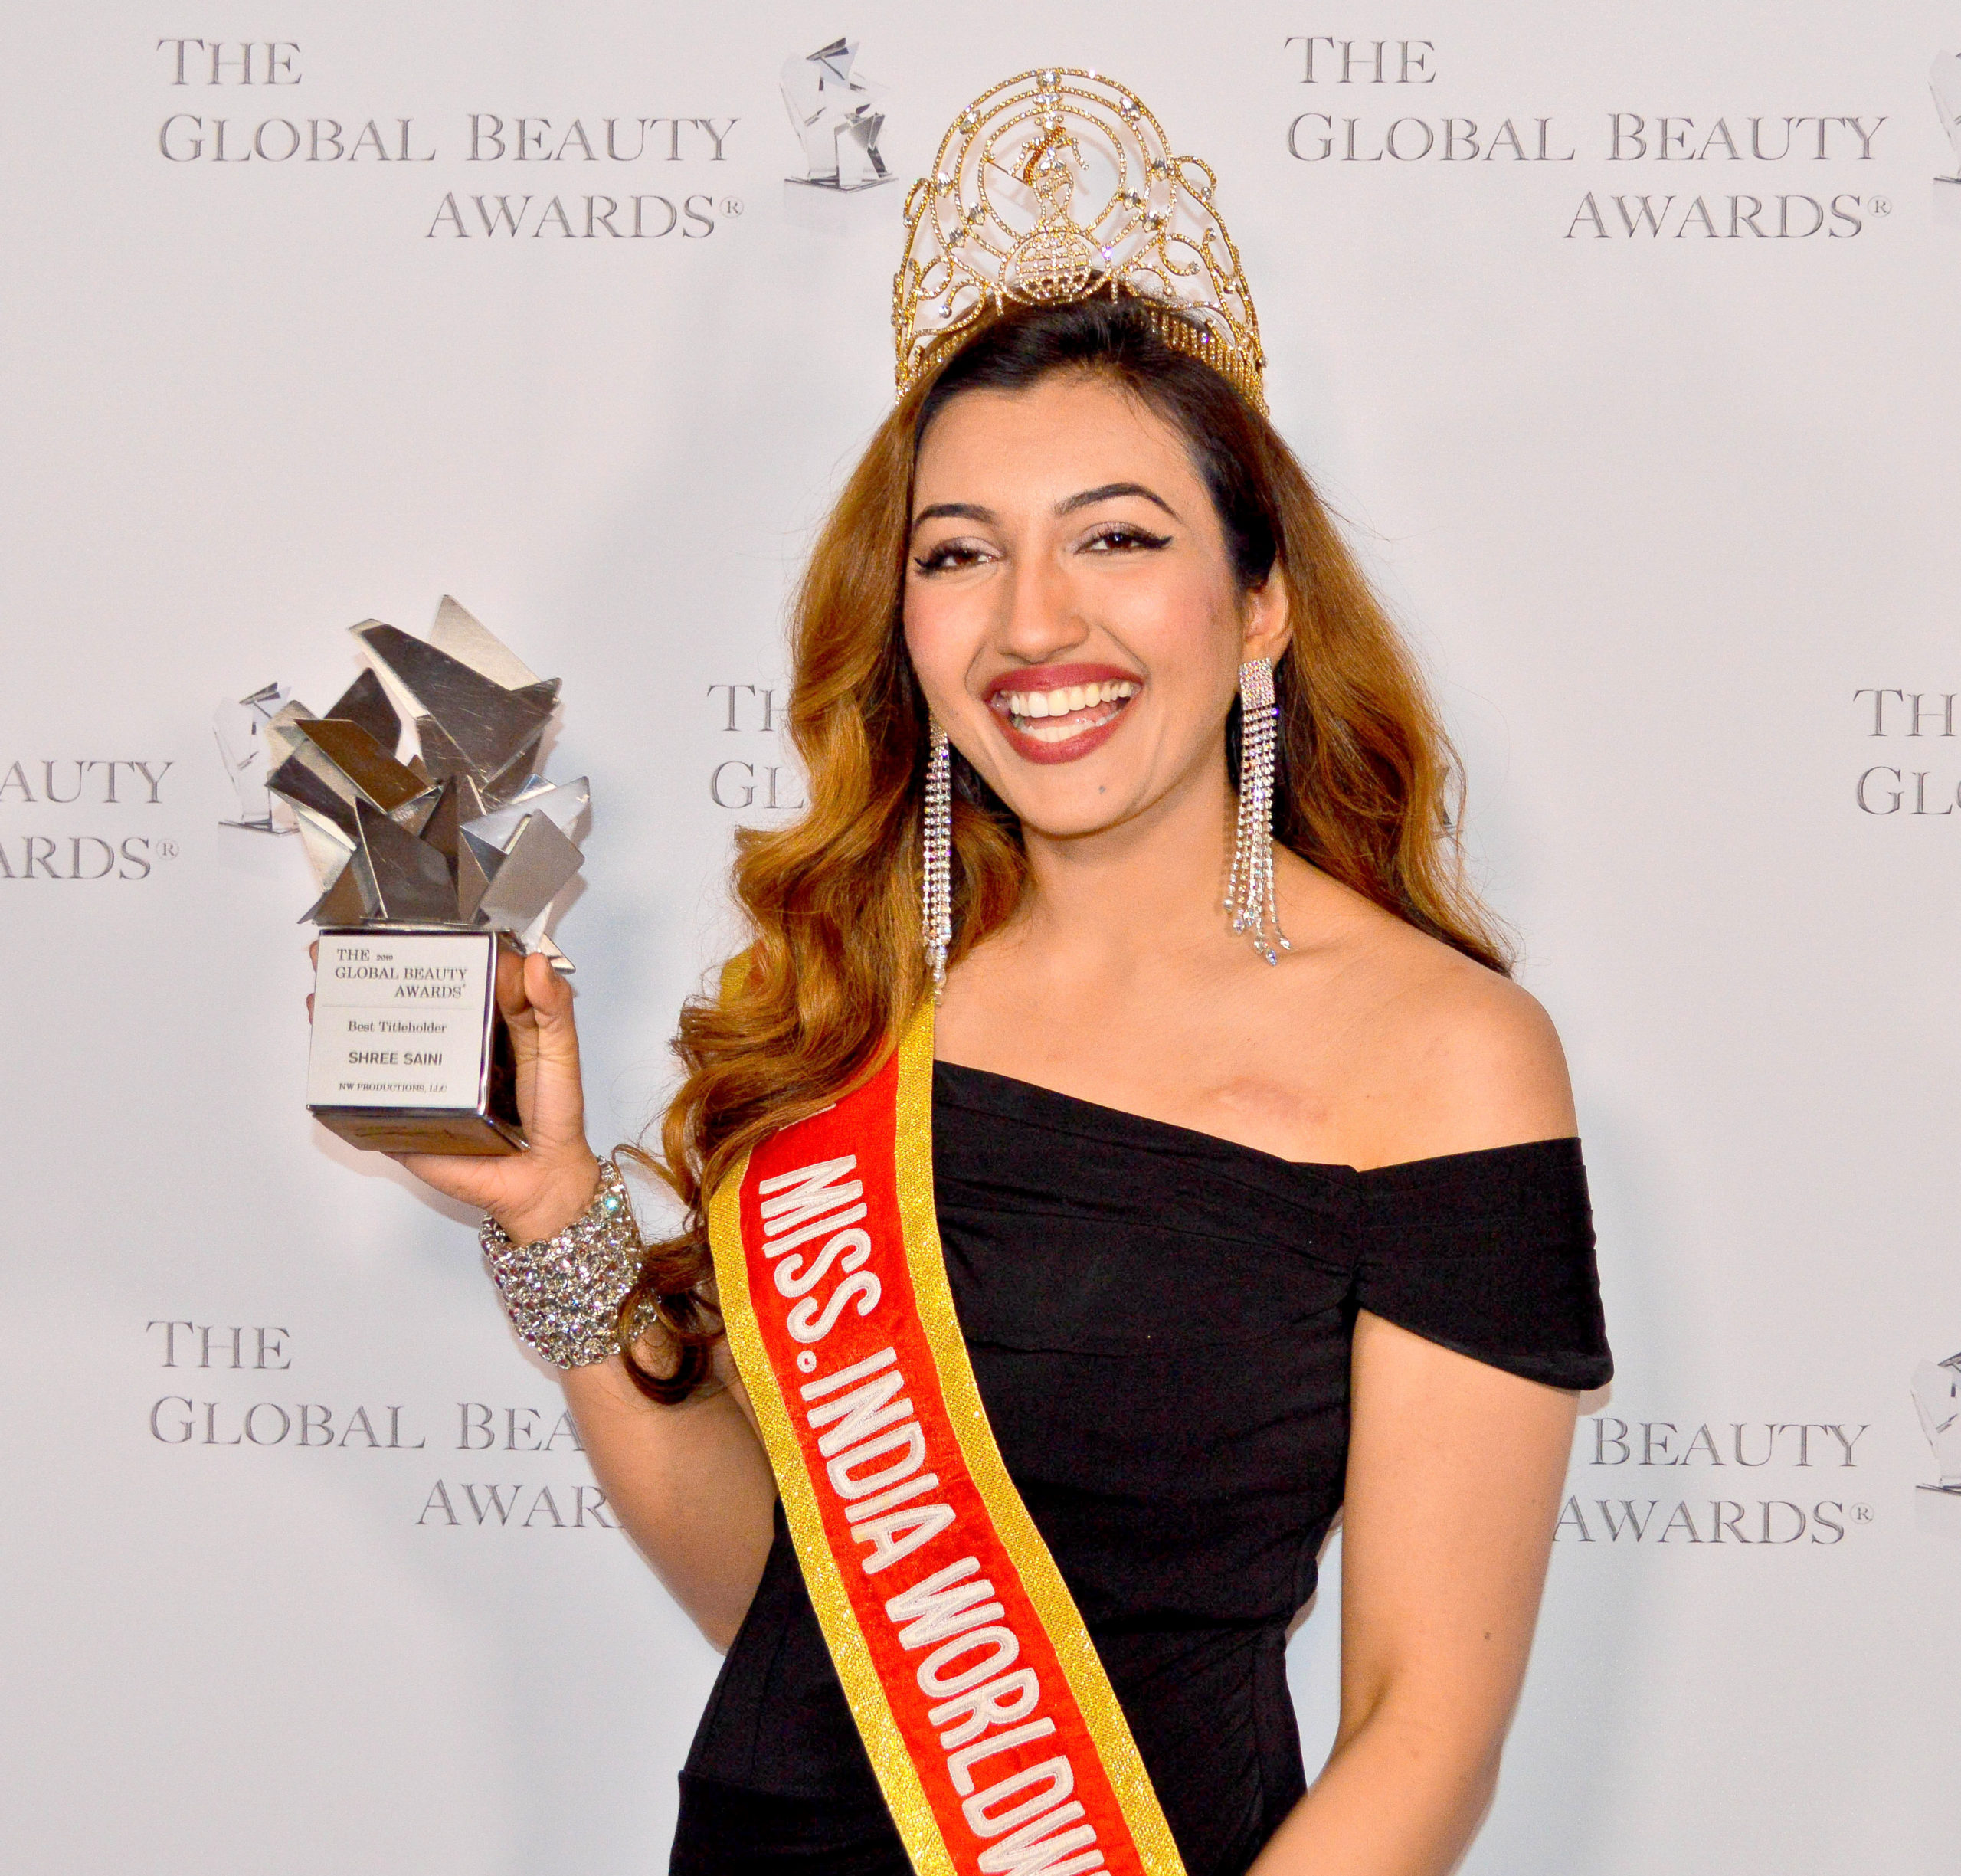 Global Beauty Awards, beauty pageants, pagentry magazine